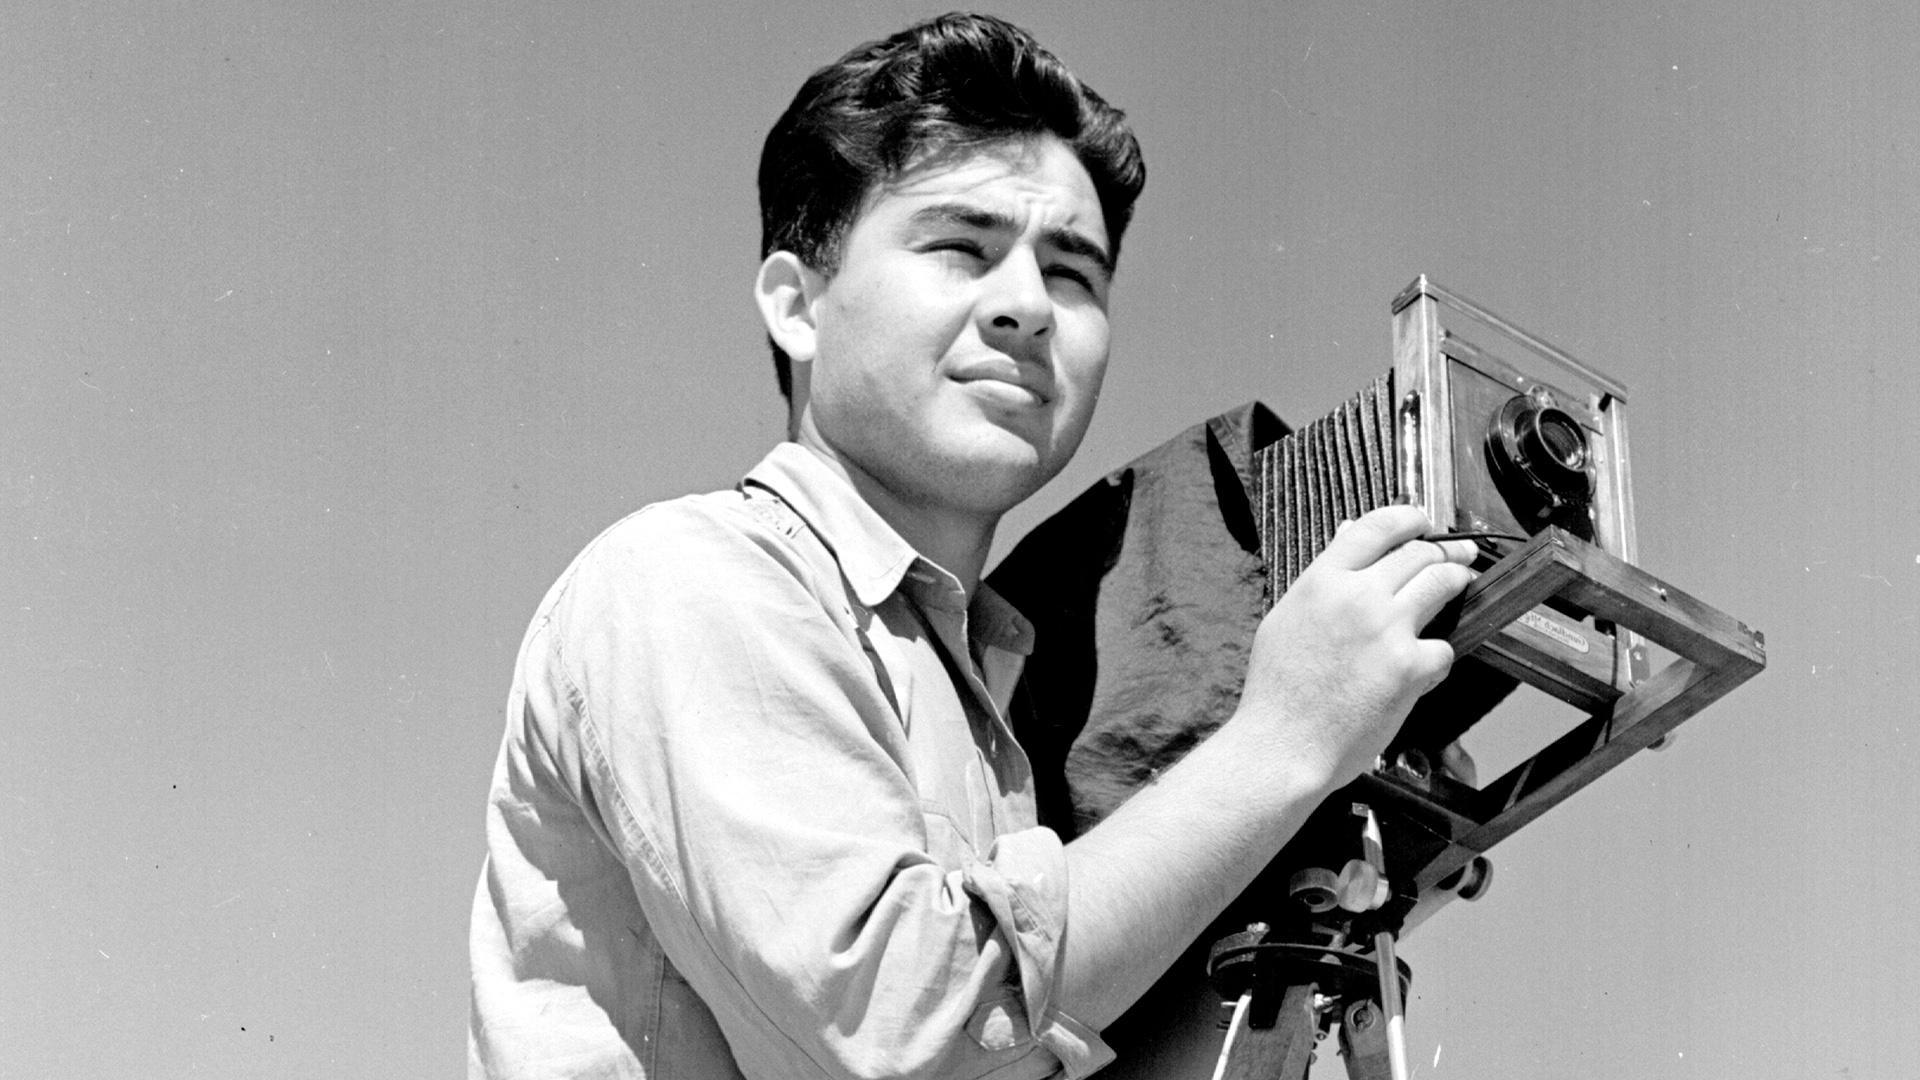 Pedro E. Guerrero: A Photographer's Journey - Preview | American Masters | PBS